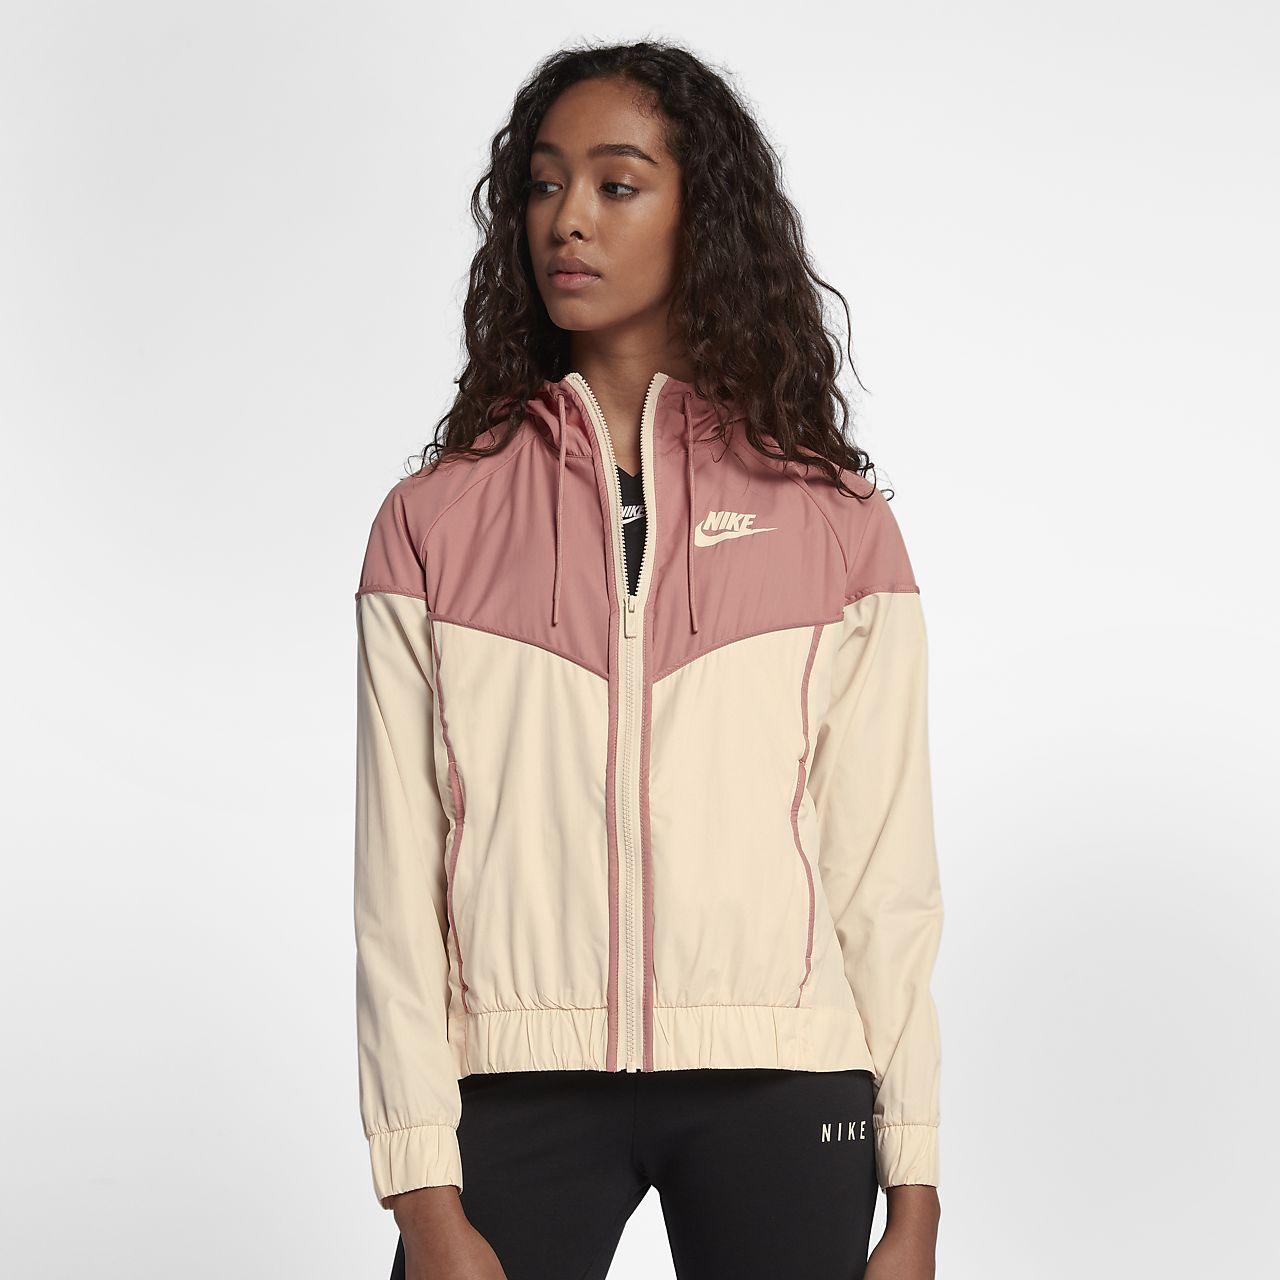 d8f4aec92537 Coupe-vent tissé Nike Sportswear Windrunner pour Femme. Nike.com FR